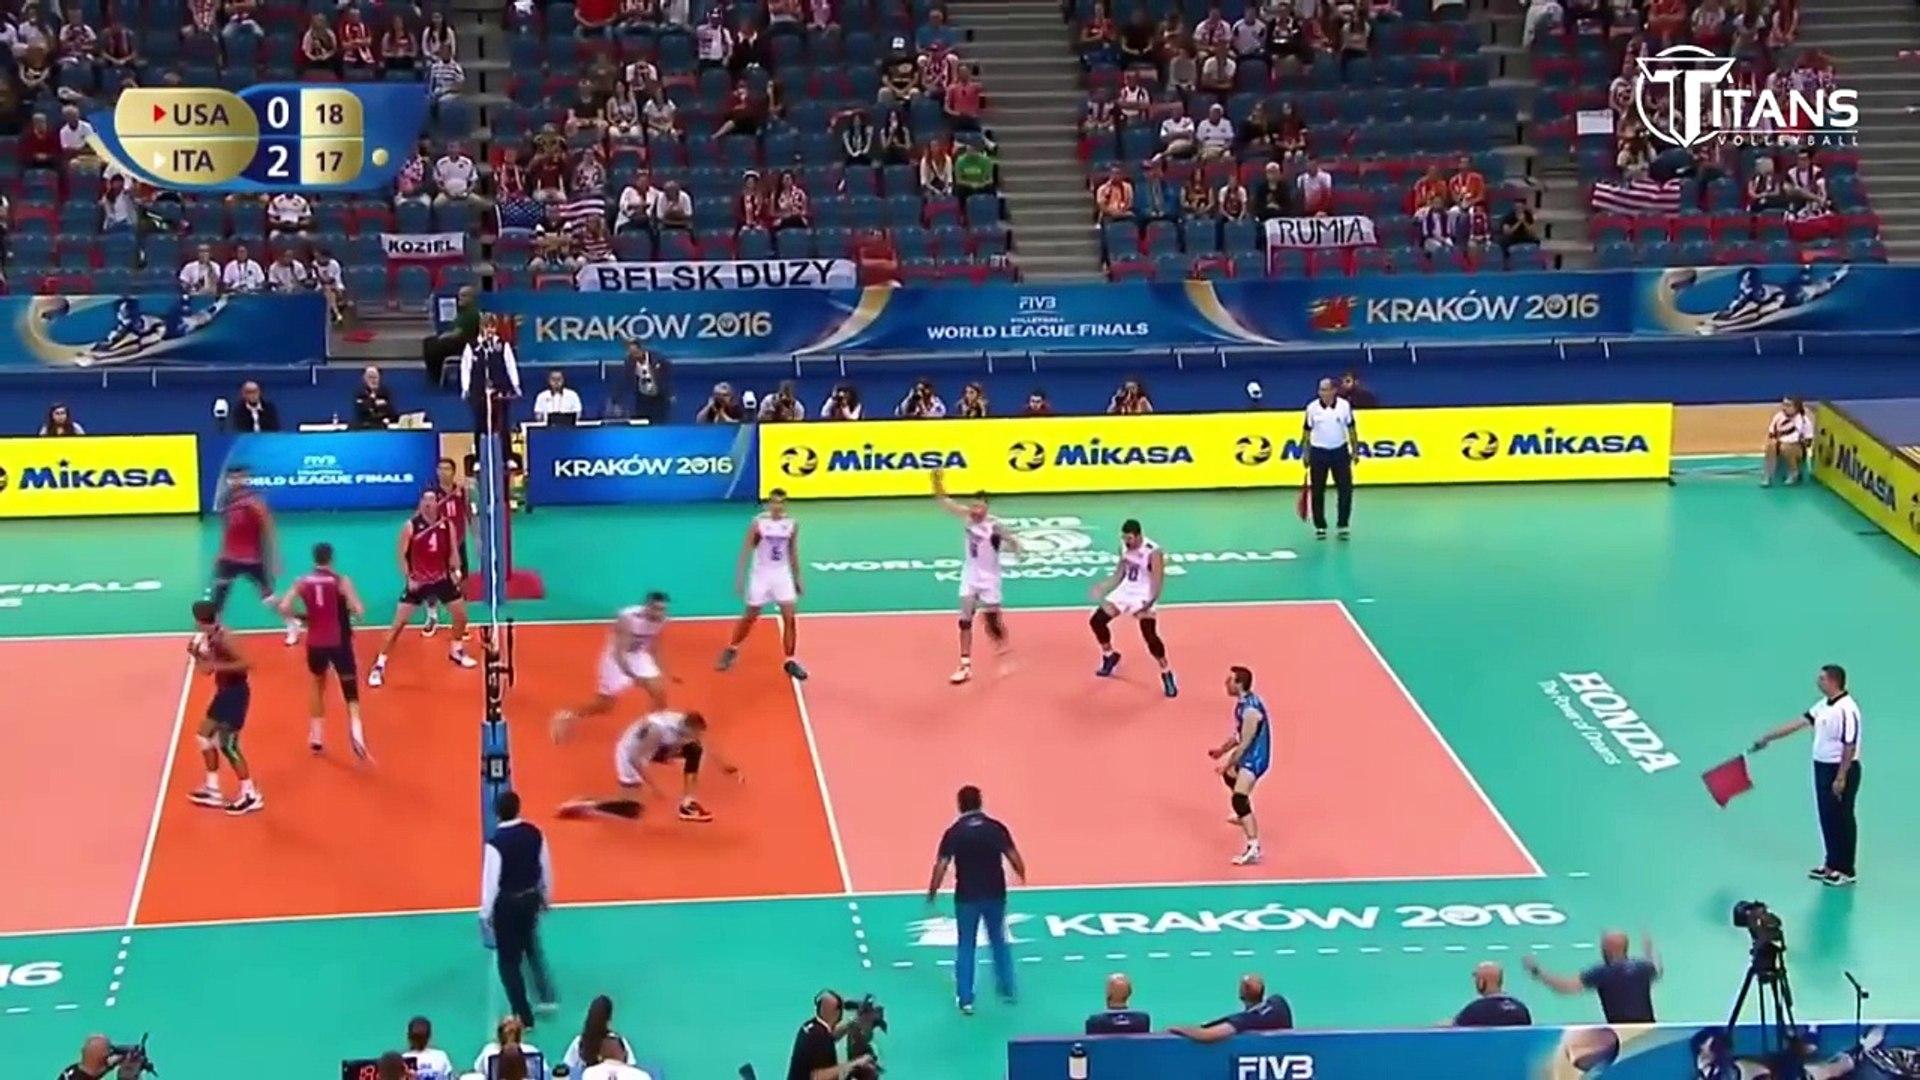 Top 10 MONSTER Blocks of All Time Volleyball - Лучшие 10 блоков в волейболе за все времена